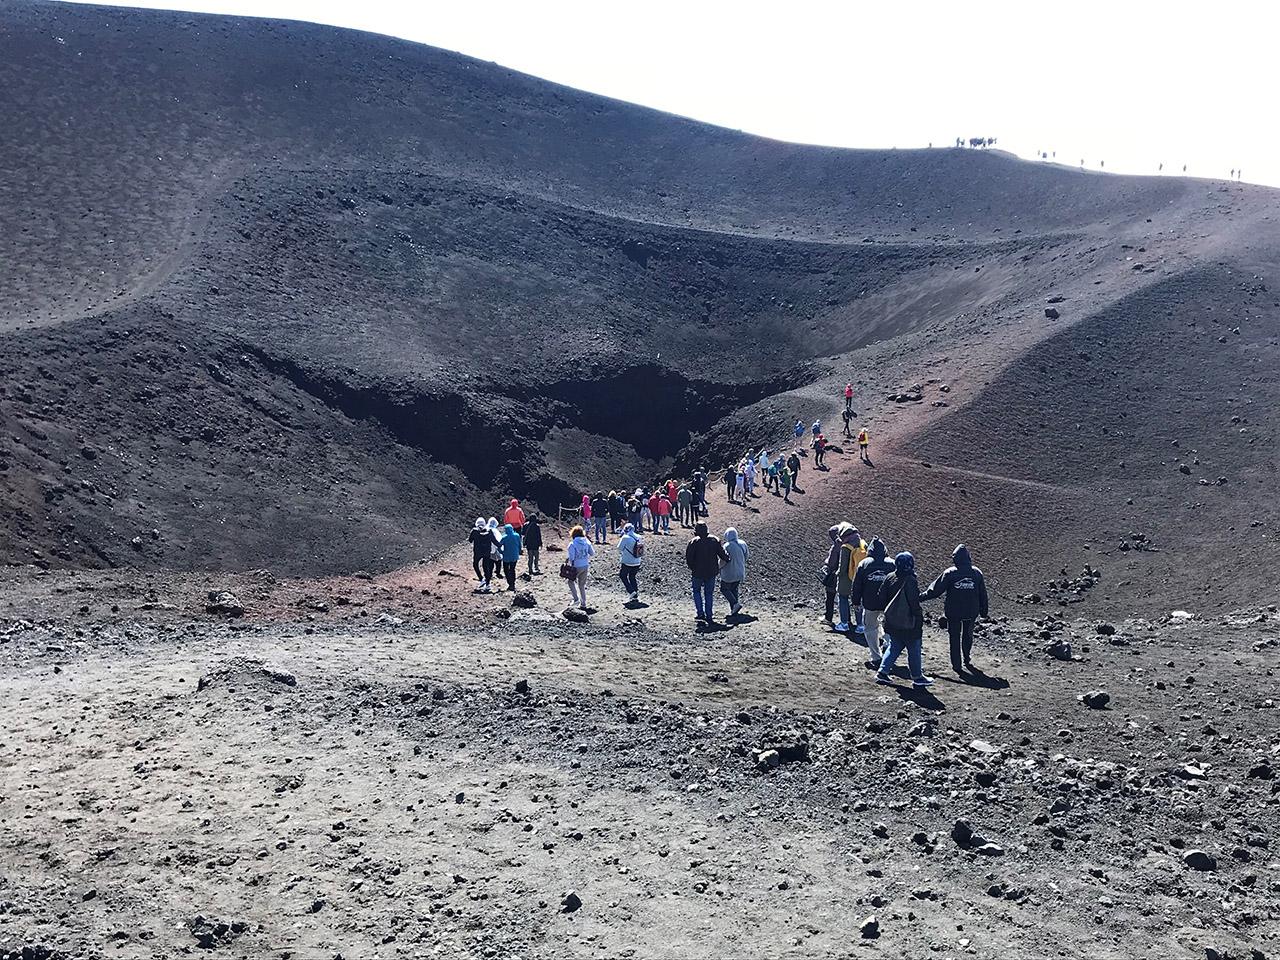 Wide shot of Travels walking up rocky slope